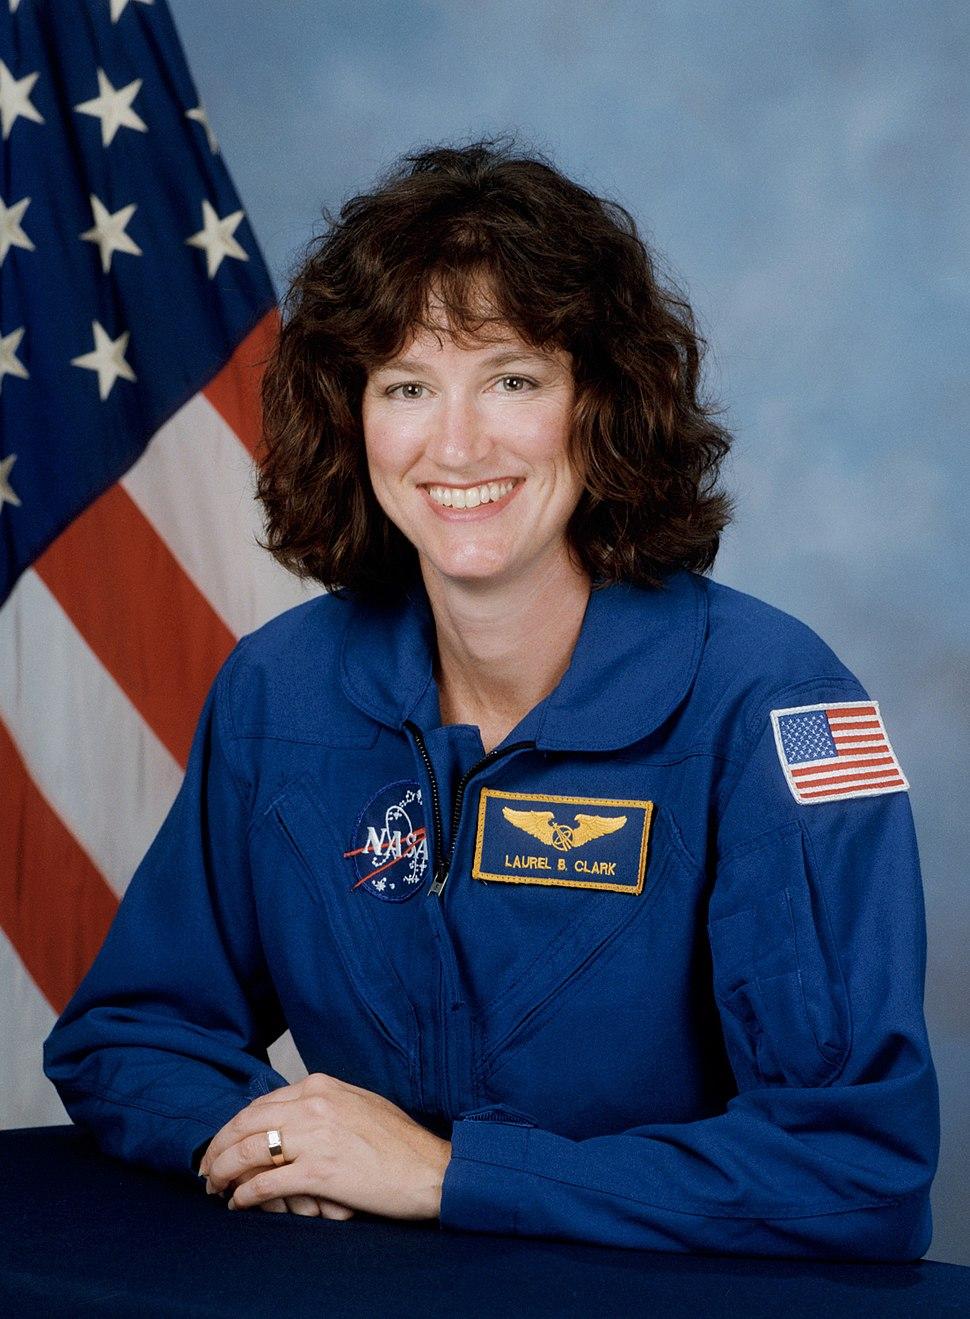 Laurel Clark, NASA photo portrait in blue suit